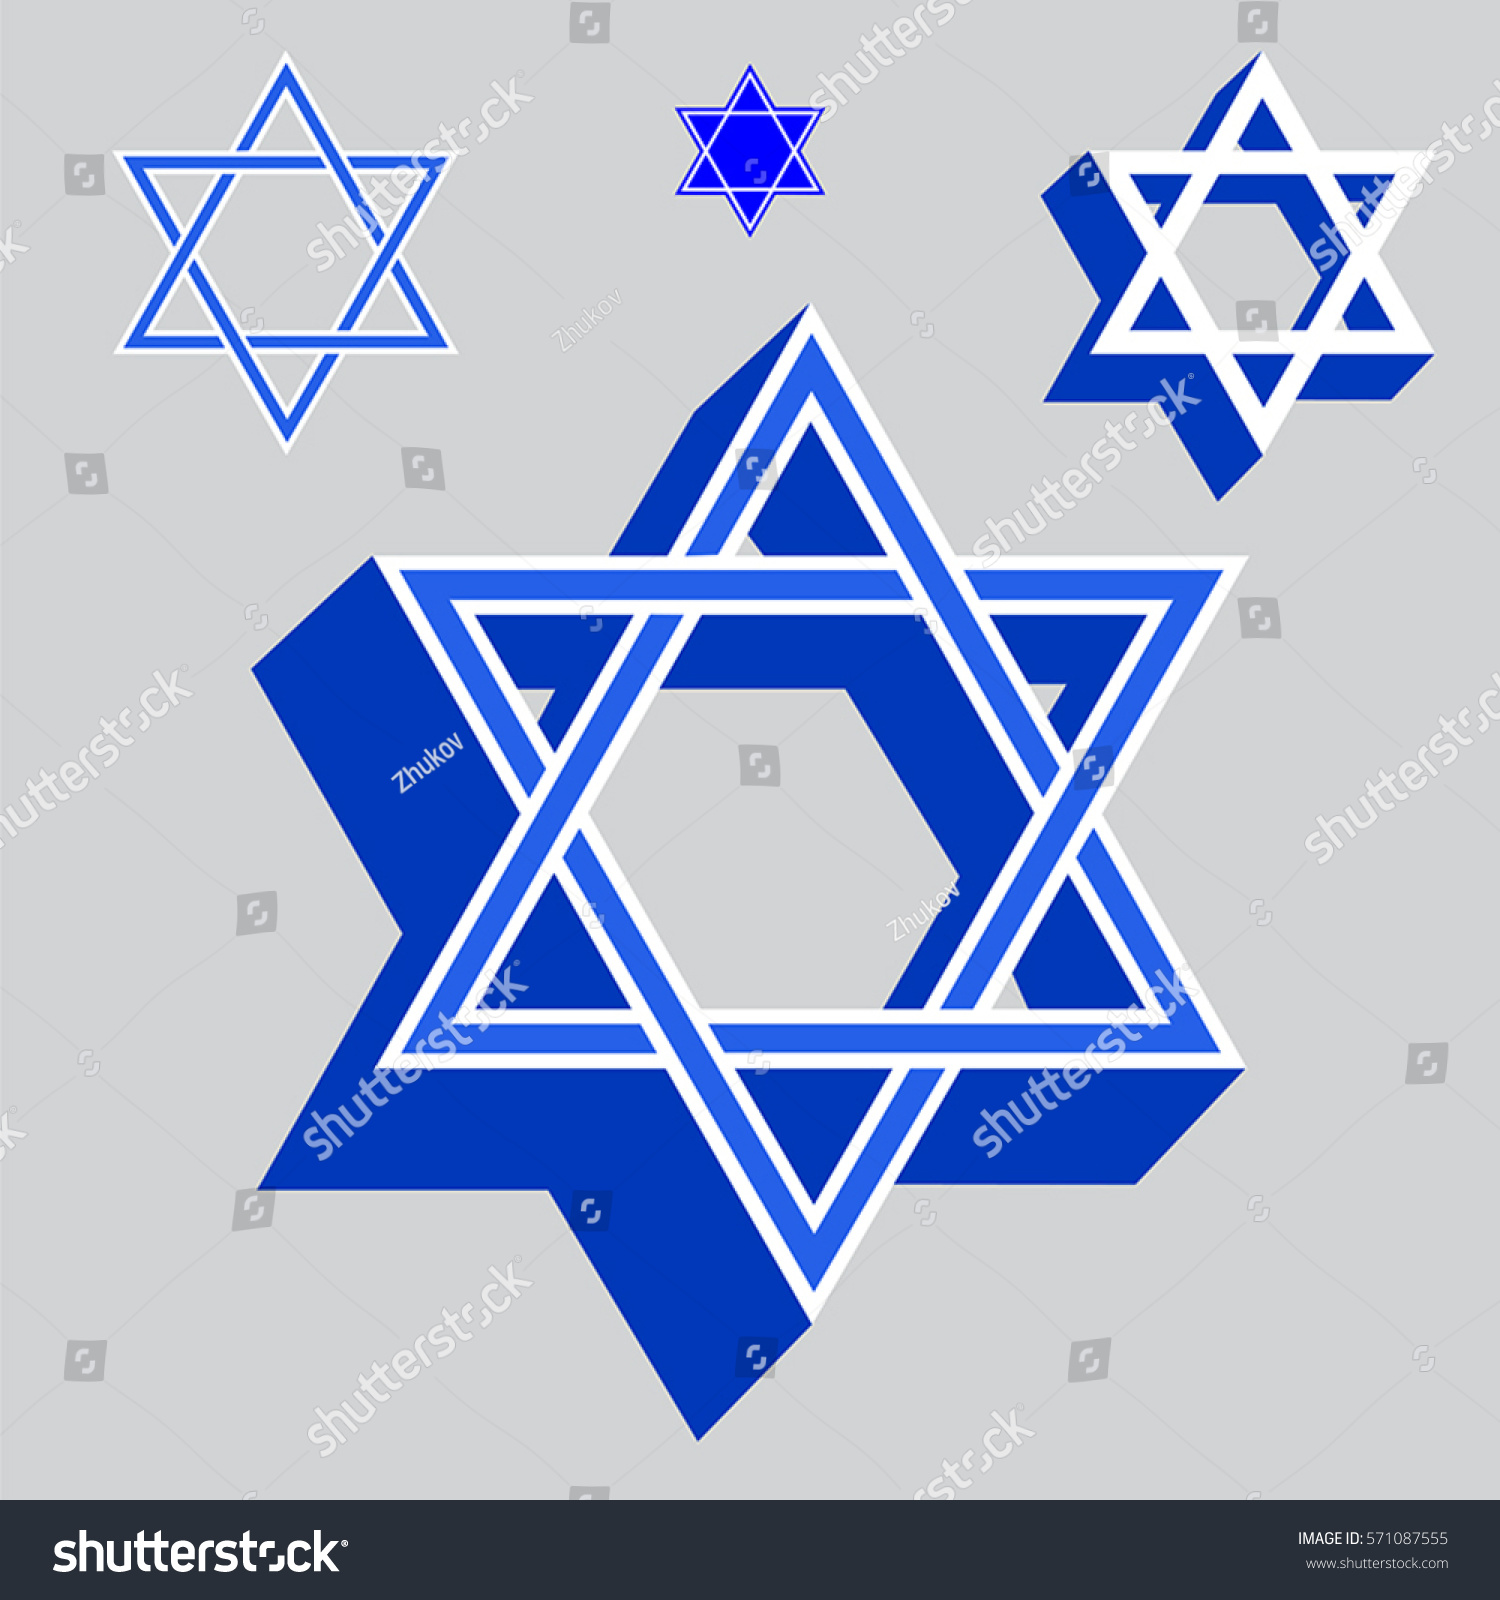 Jewish sacred symbols gallery symbol and sign ideas jewish sacred symbols gallery symbol and sign ideas star david jewish religious symbols vector stock vector biocorpaavc